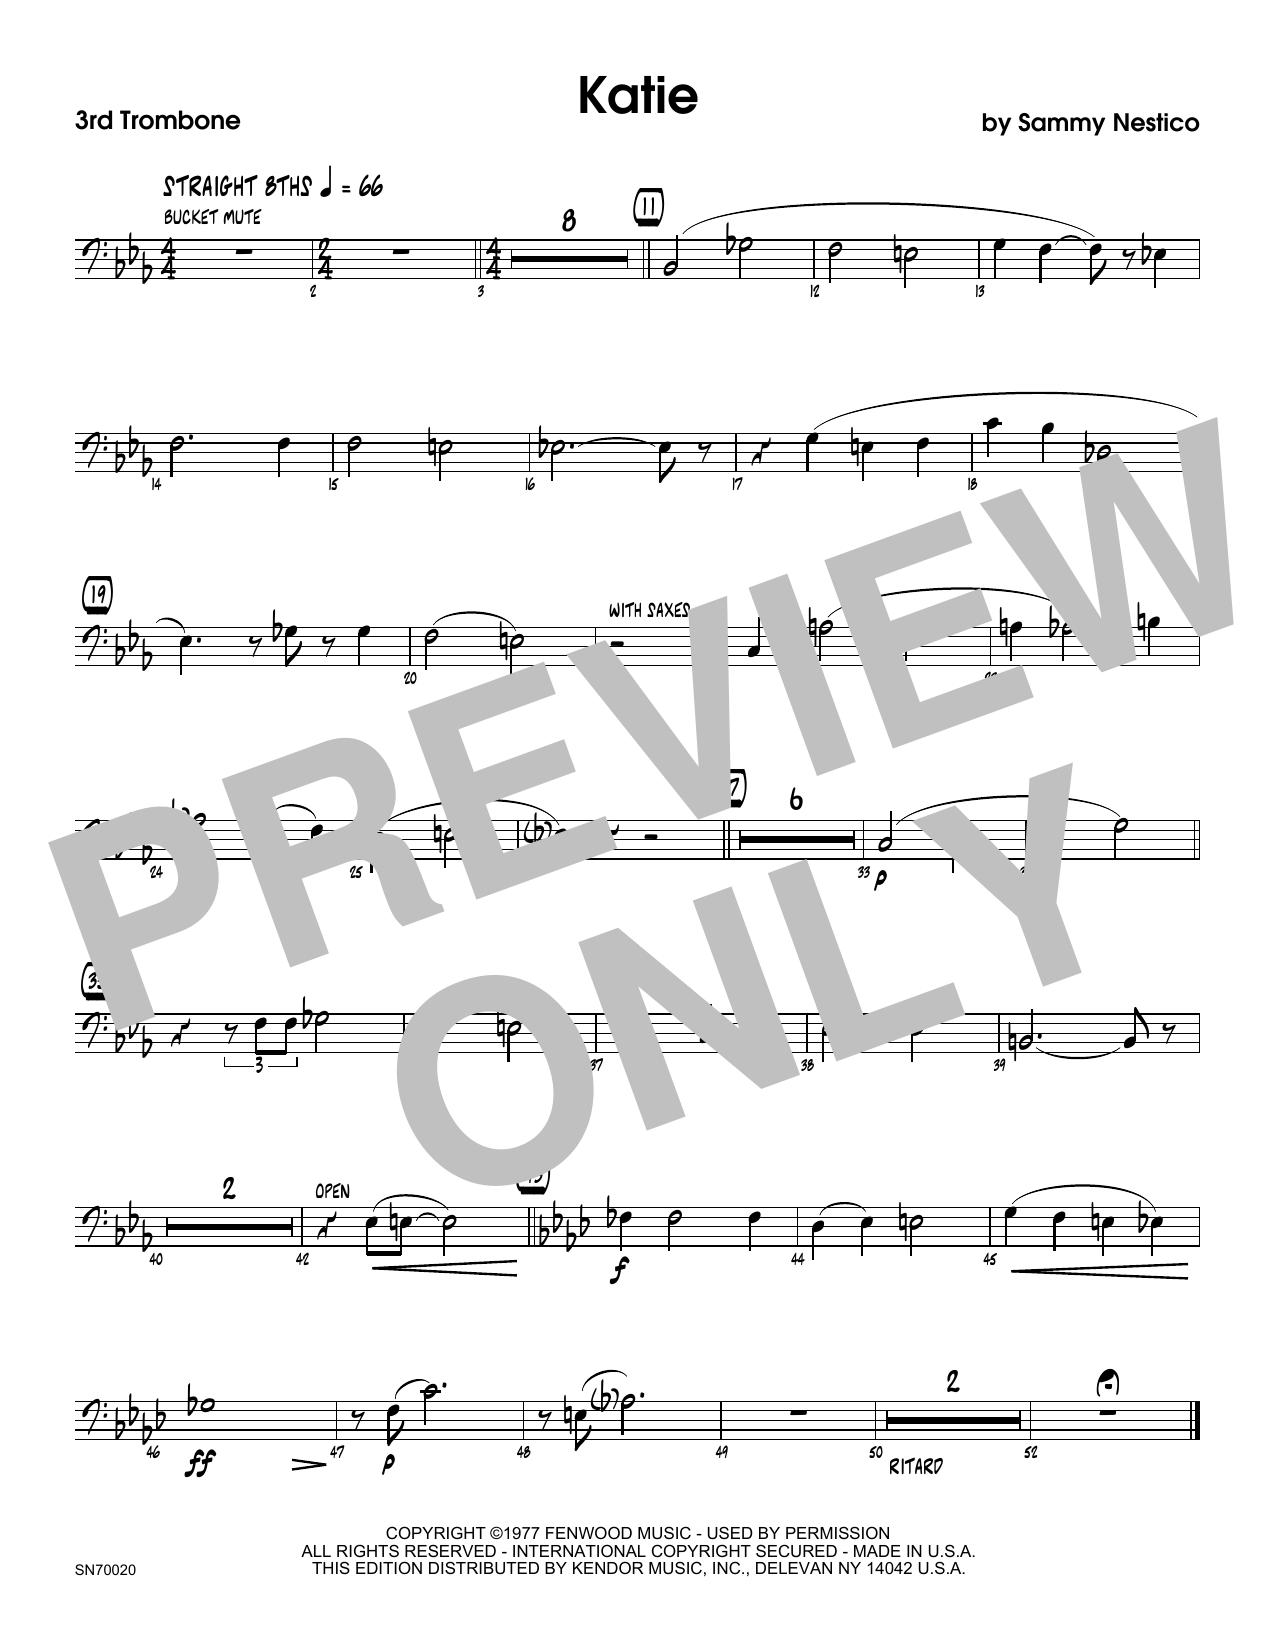 Katie - 3rd Trombone Sheet Music